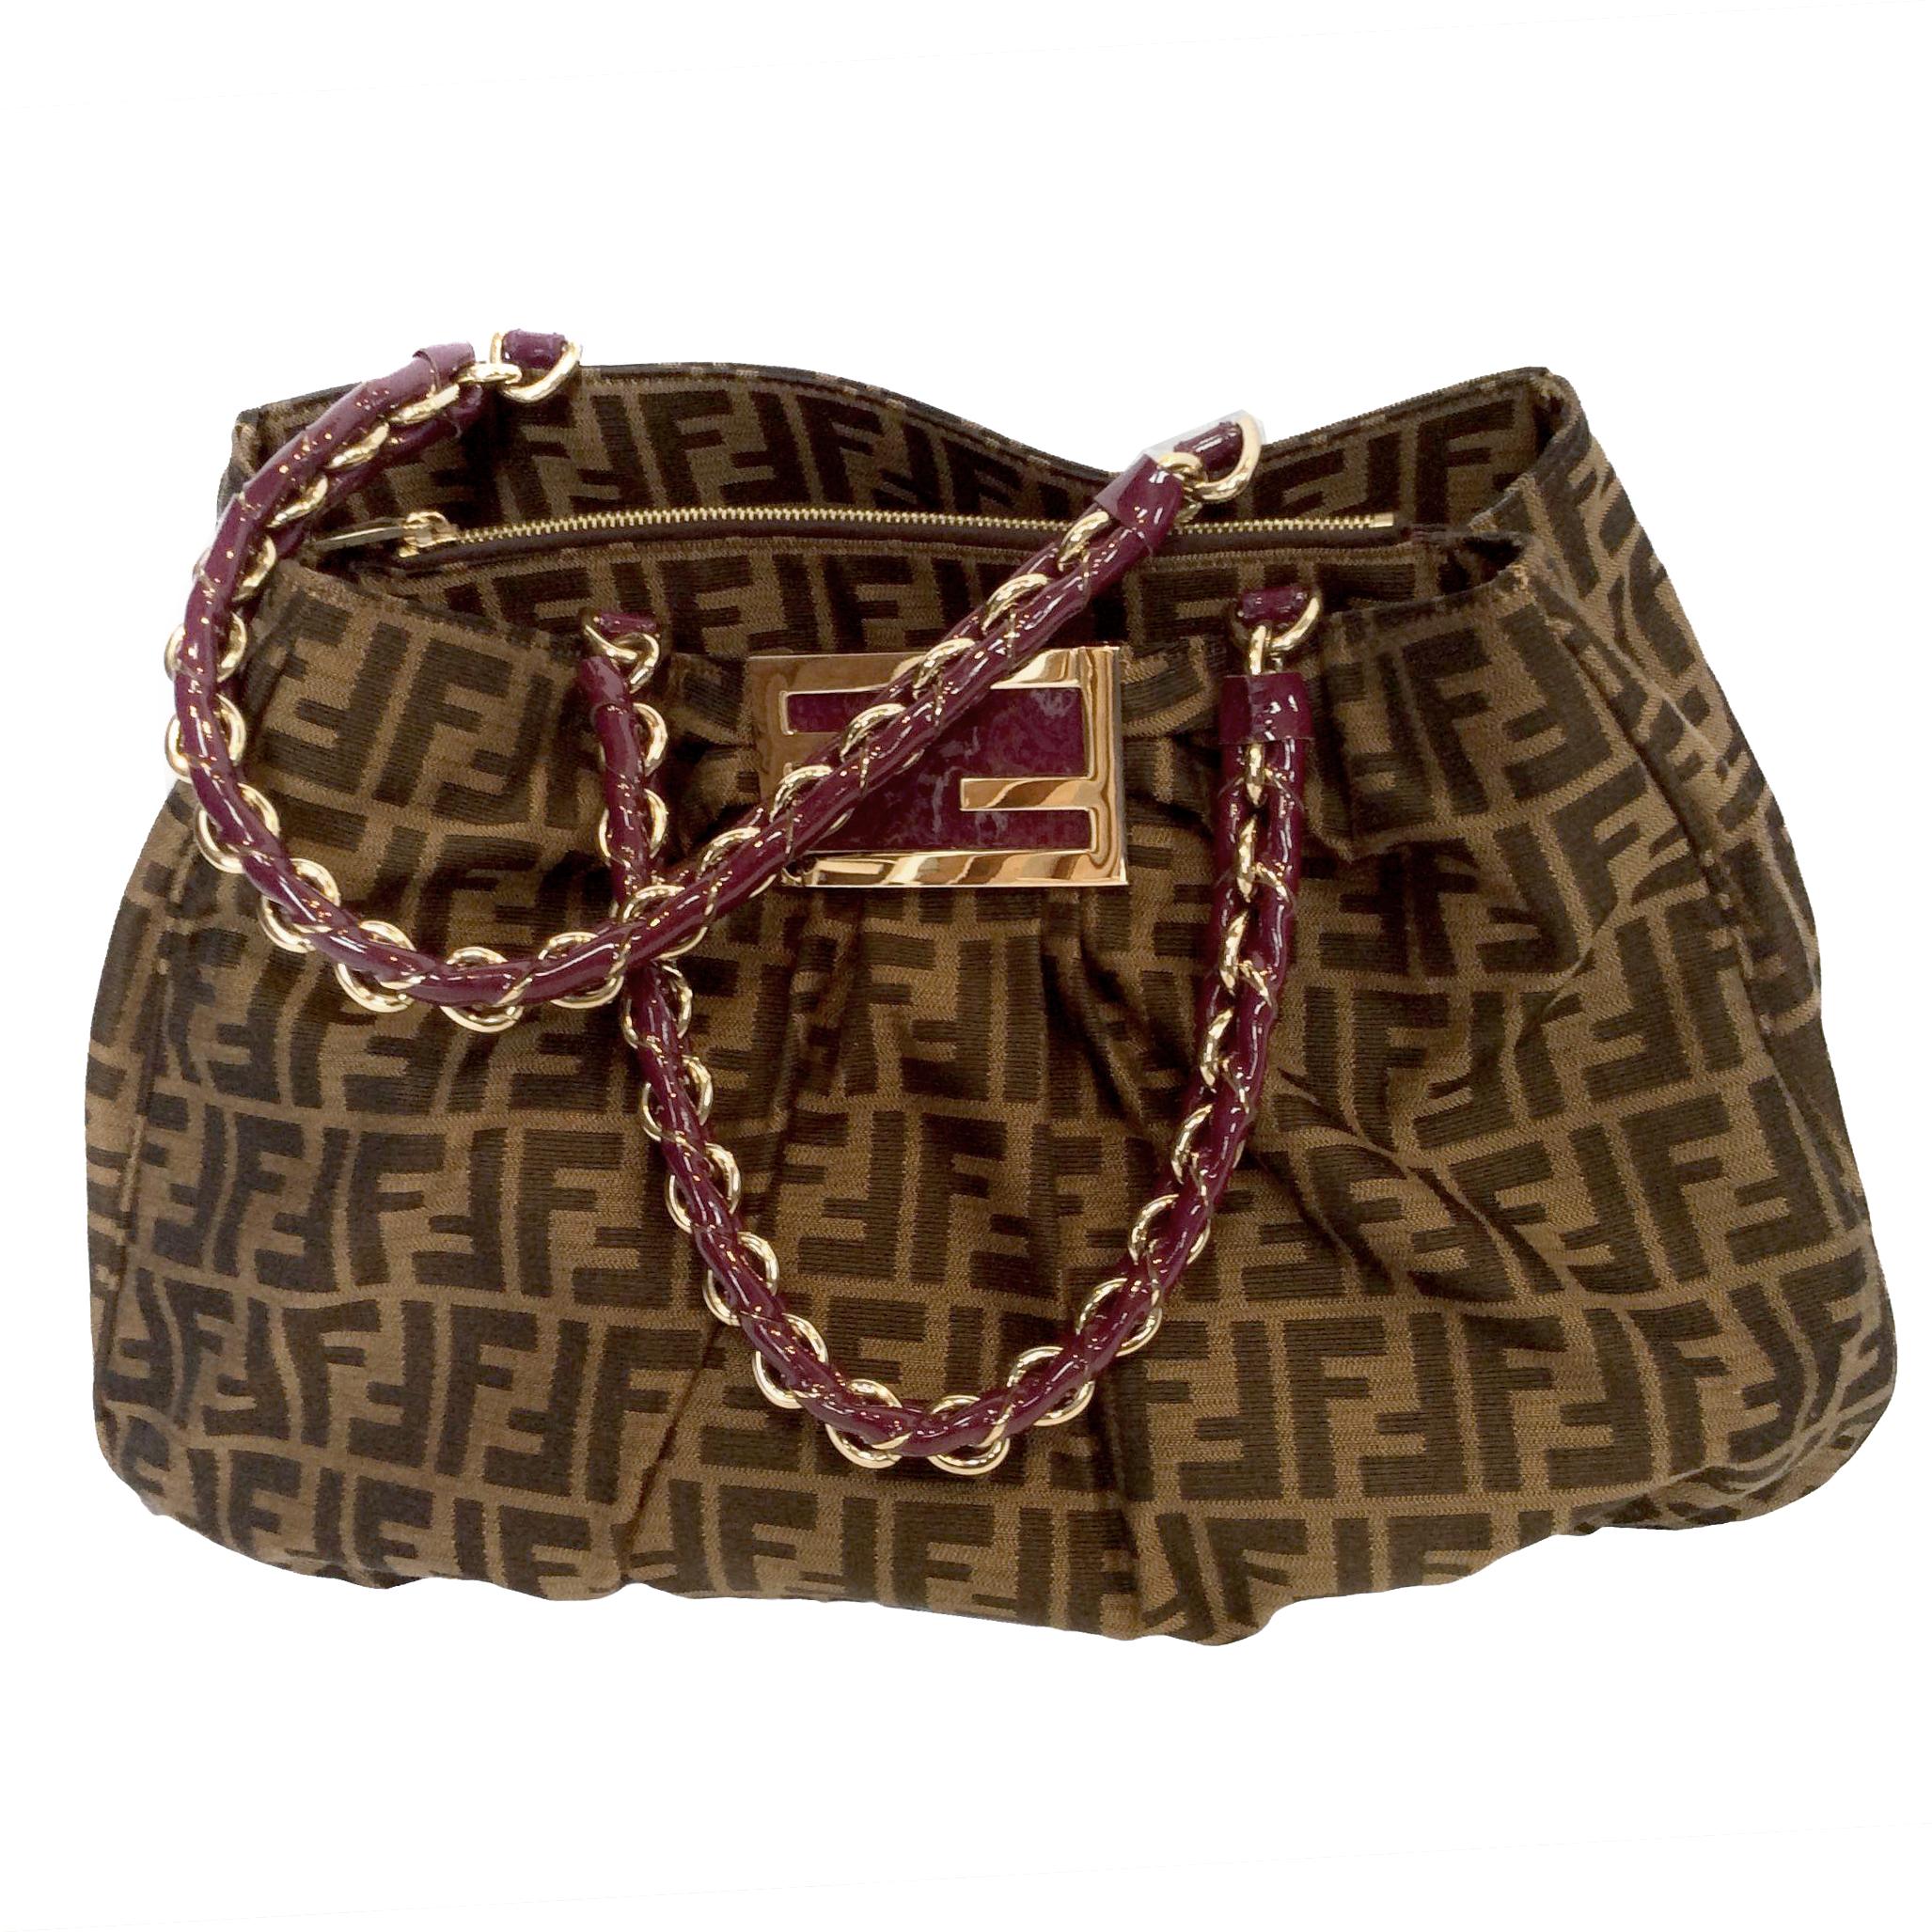 6f418187f65 Fendi Zucca And Vernice Mia Purple Bag